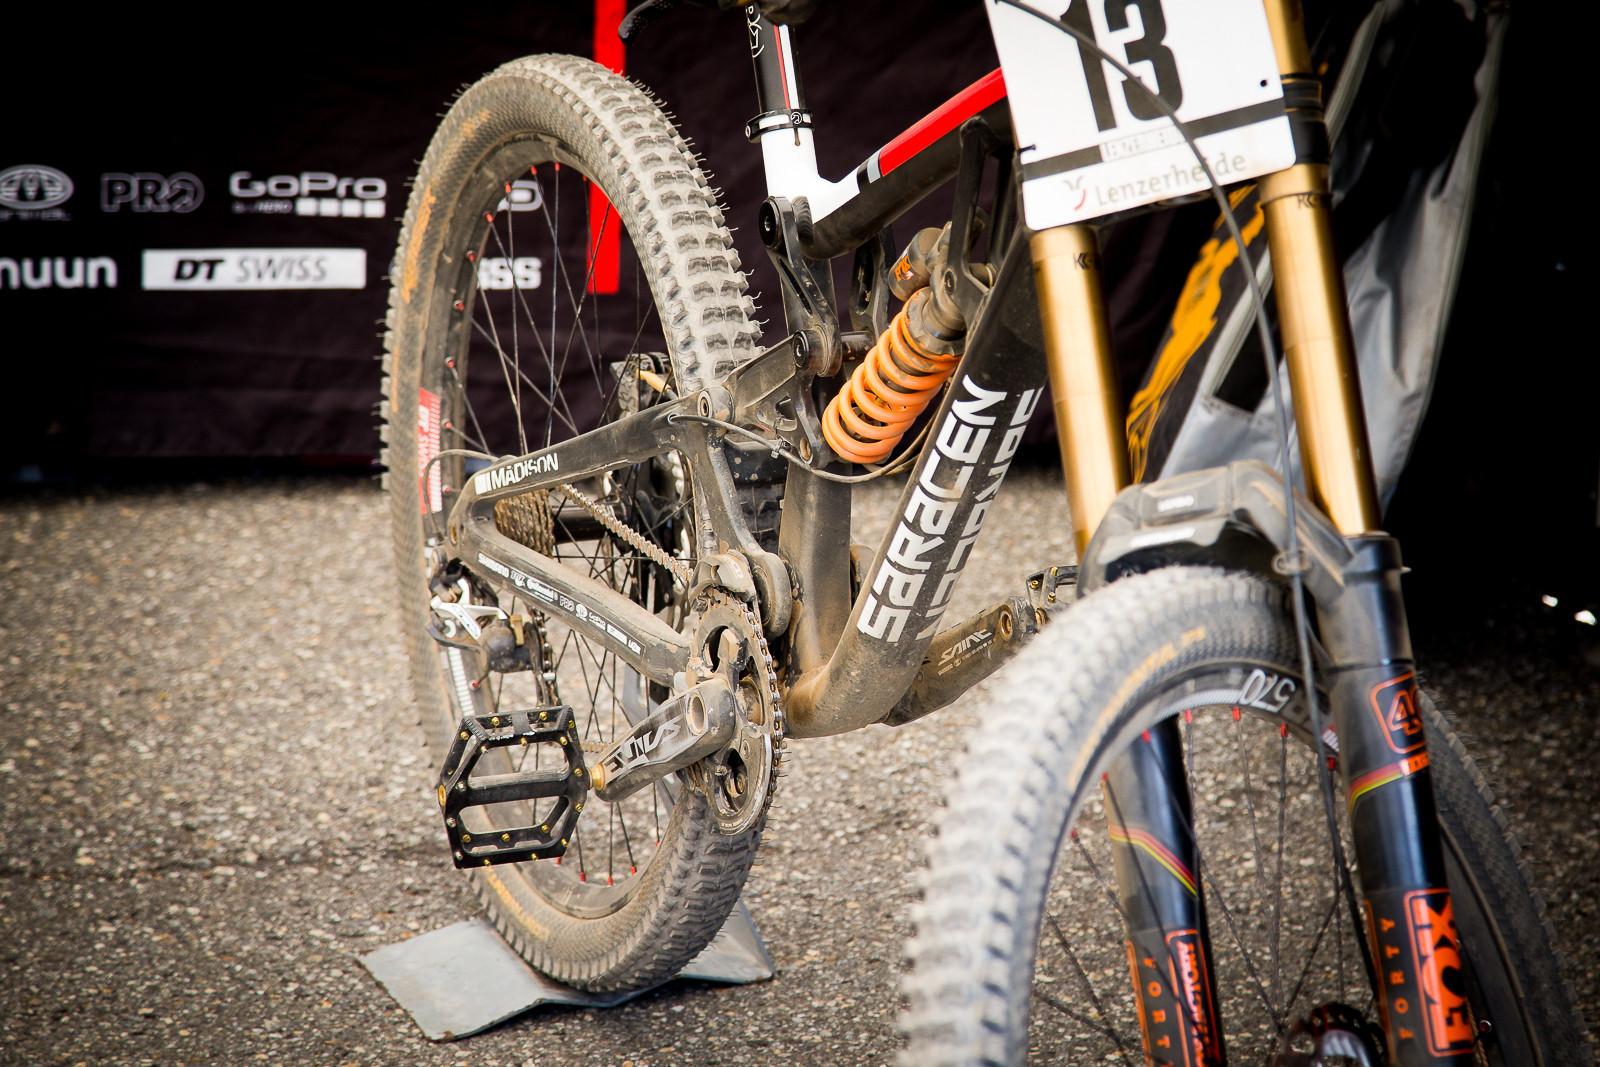 Sam Dale on Flat Pedals - PIT BITS - World Cup Lenzerheide, Switzerland - Mountain Biking Pictures - Vital MTB